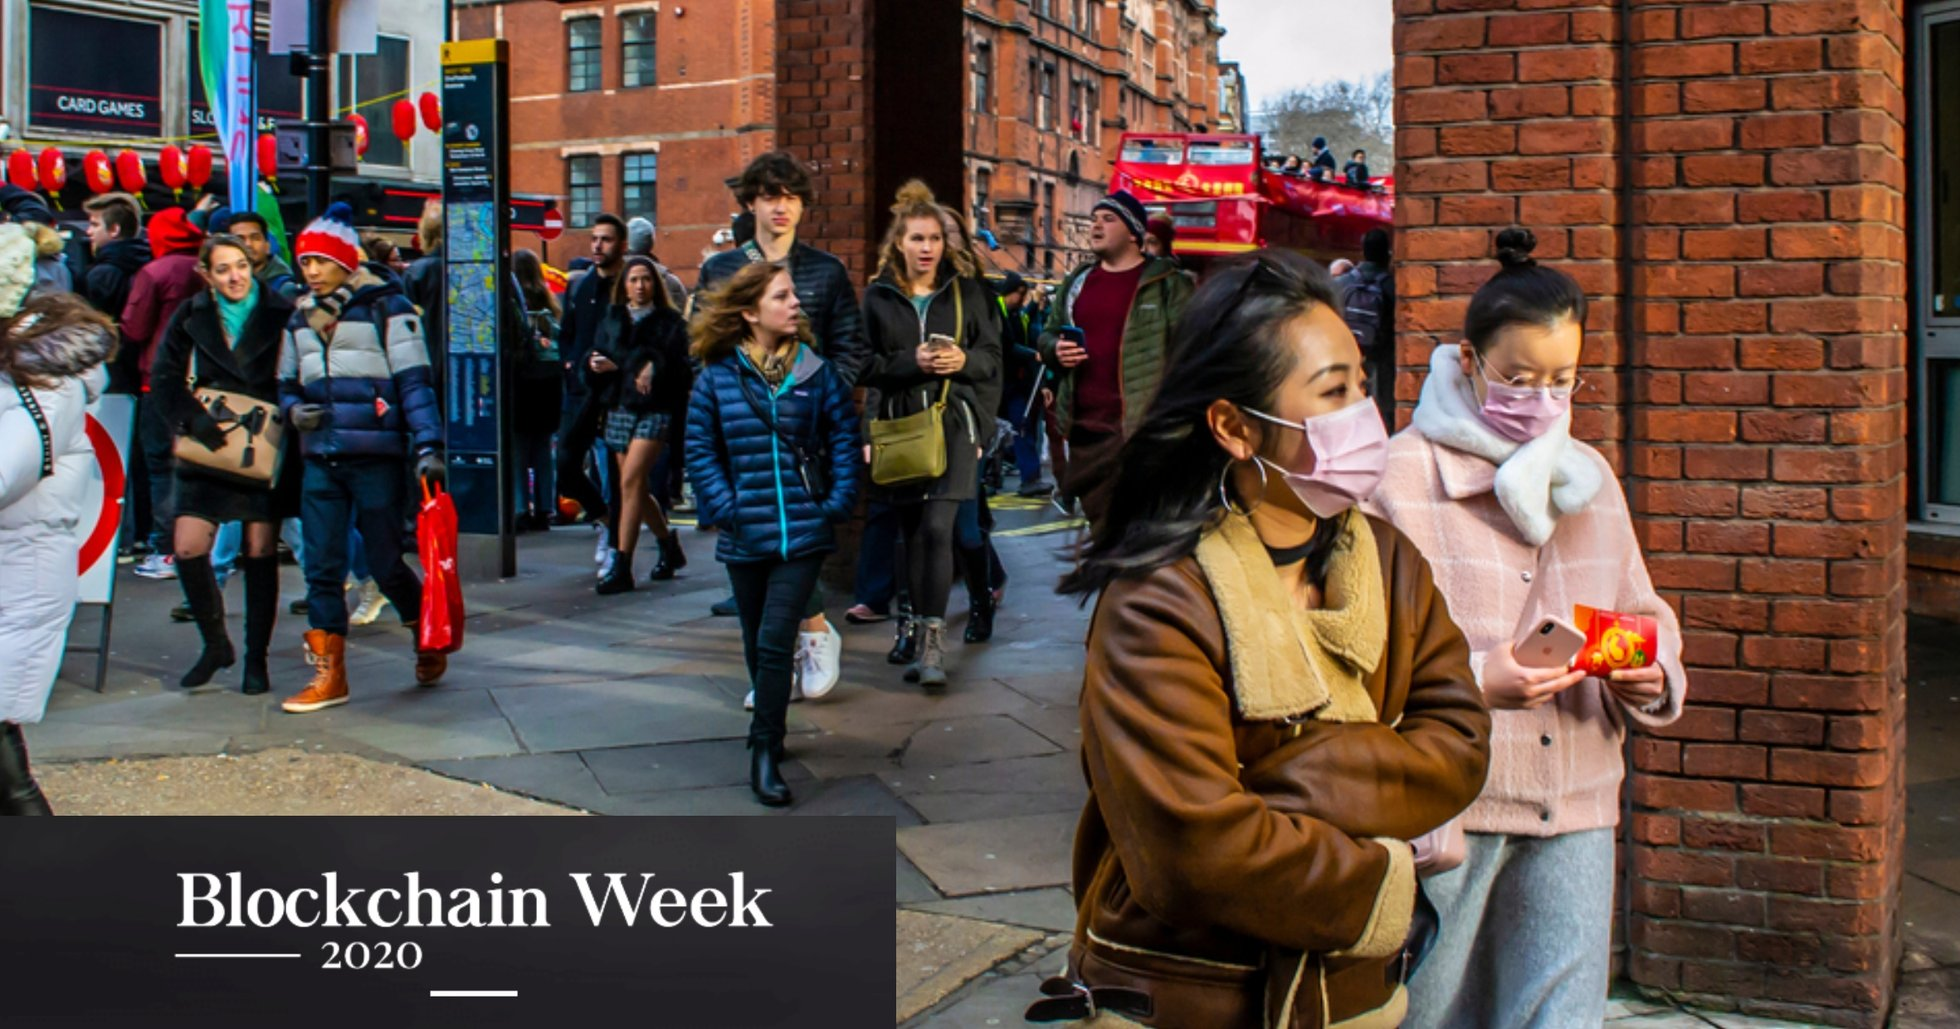 coronavirus-london-blockchain-week